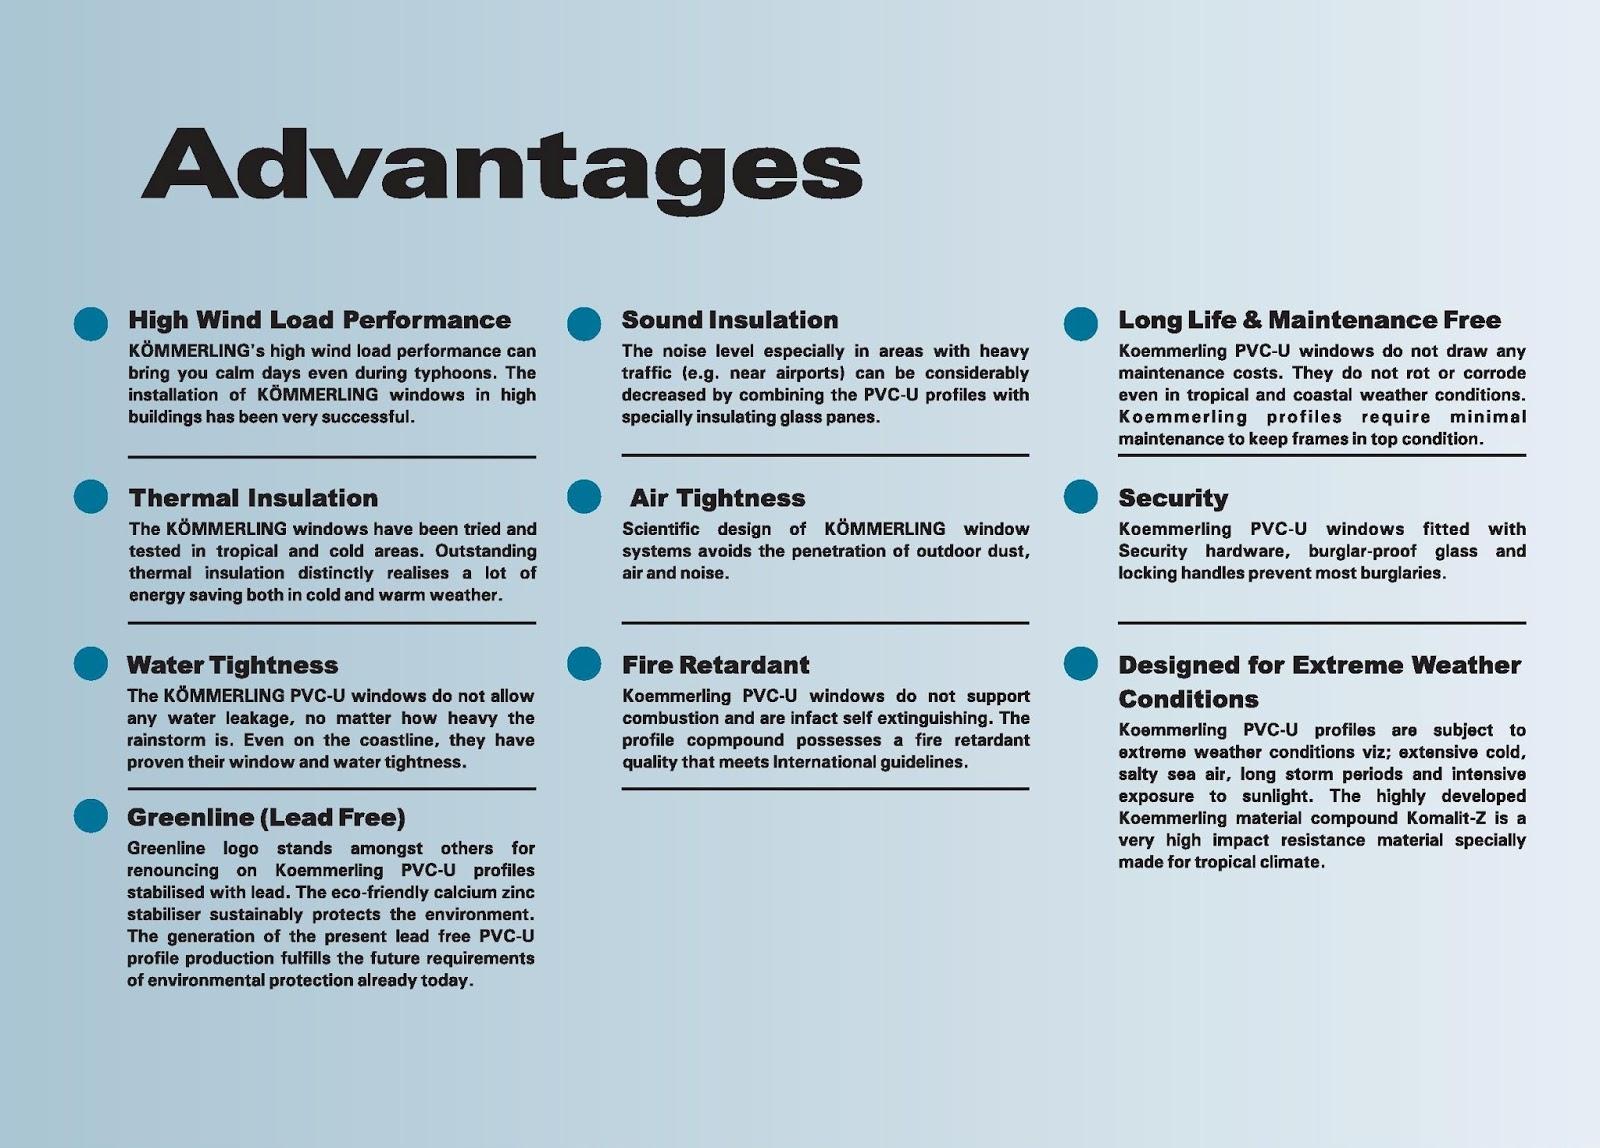 Advantages of windows 7